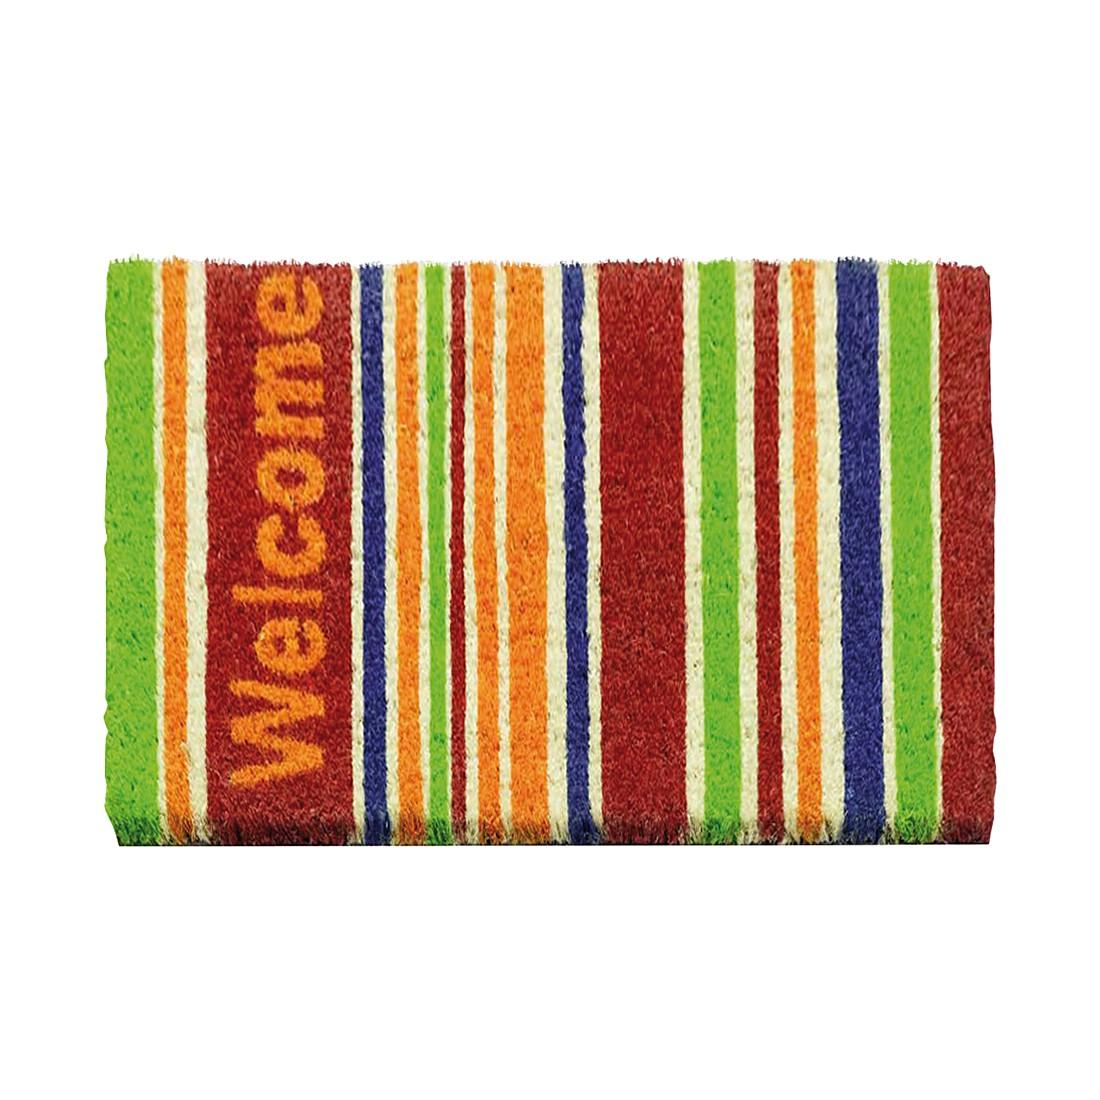 Kokosmatte RUCO Welcome Stripes - Mehrfarbig, Siena Home